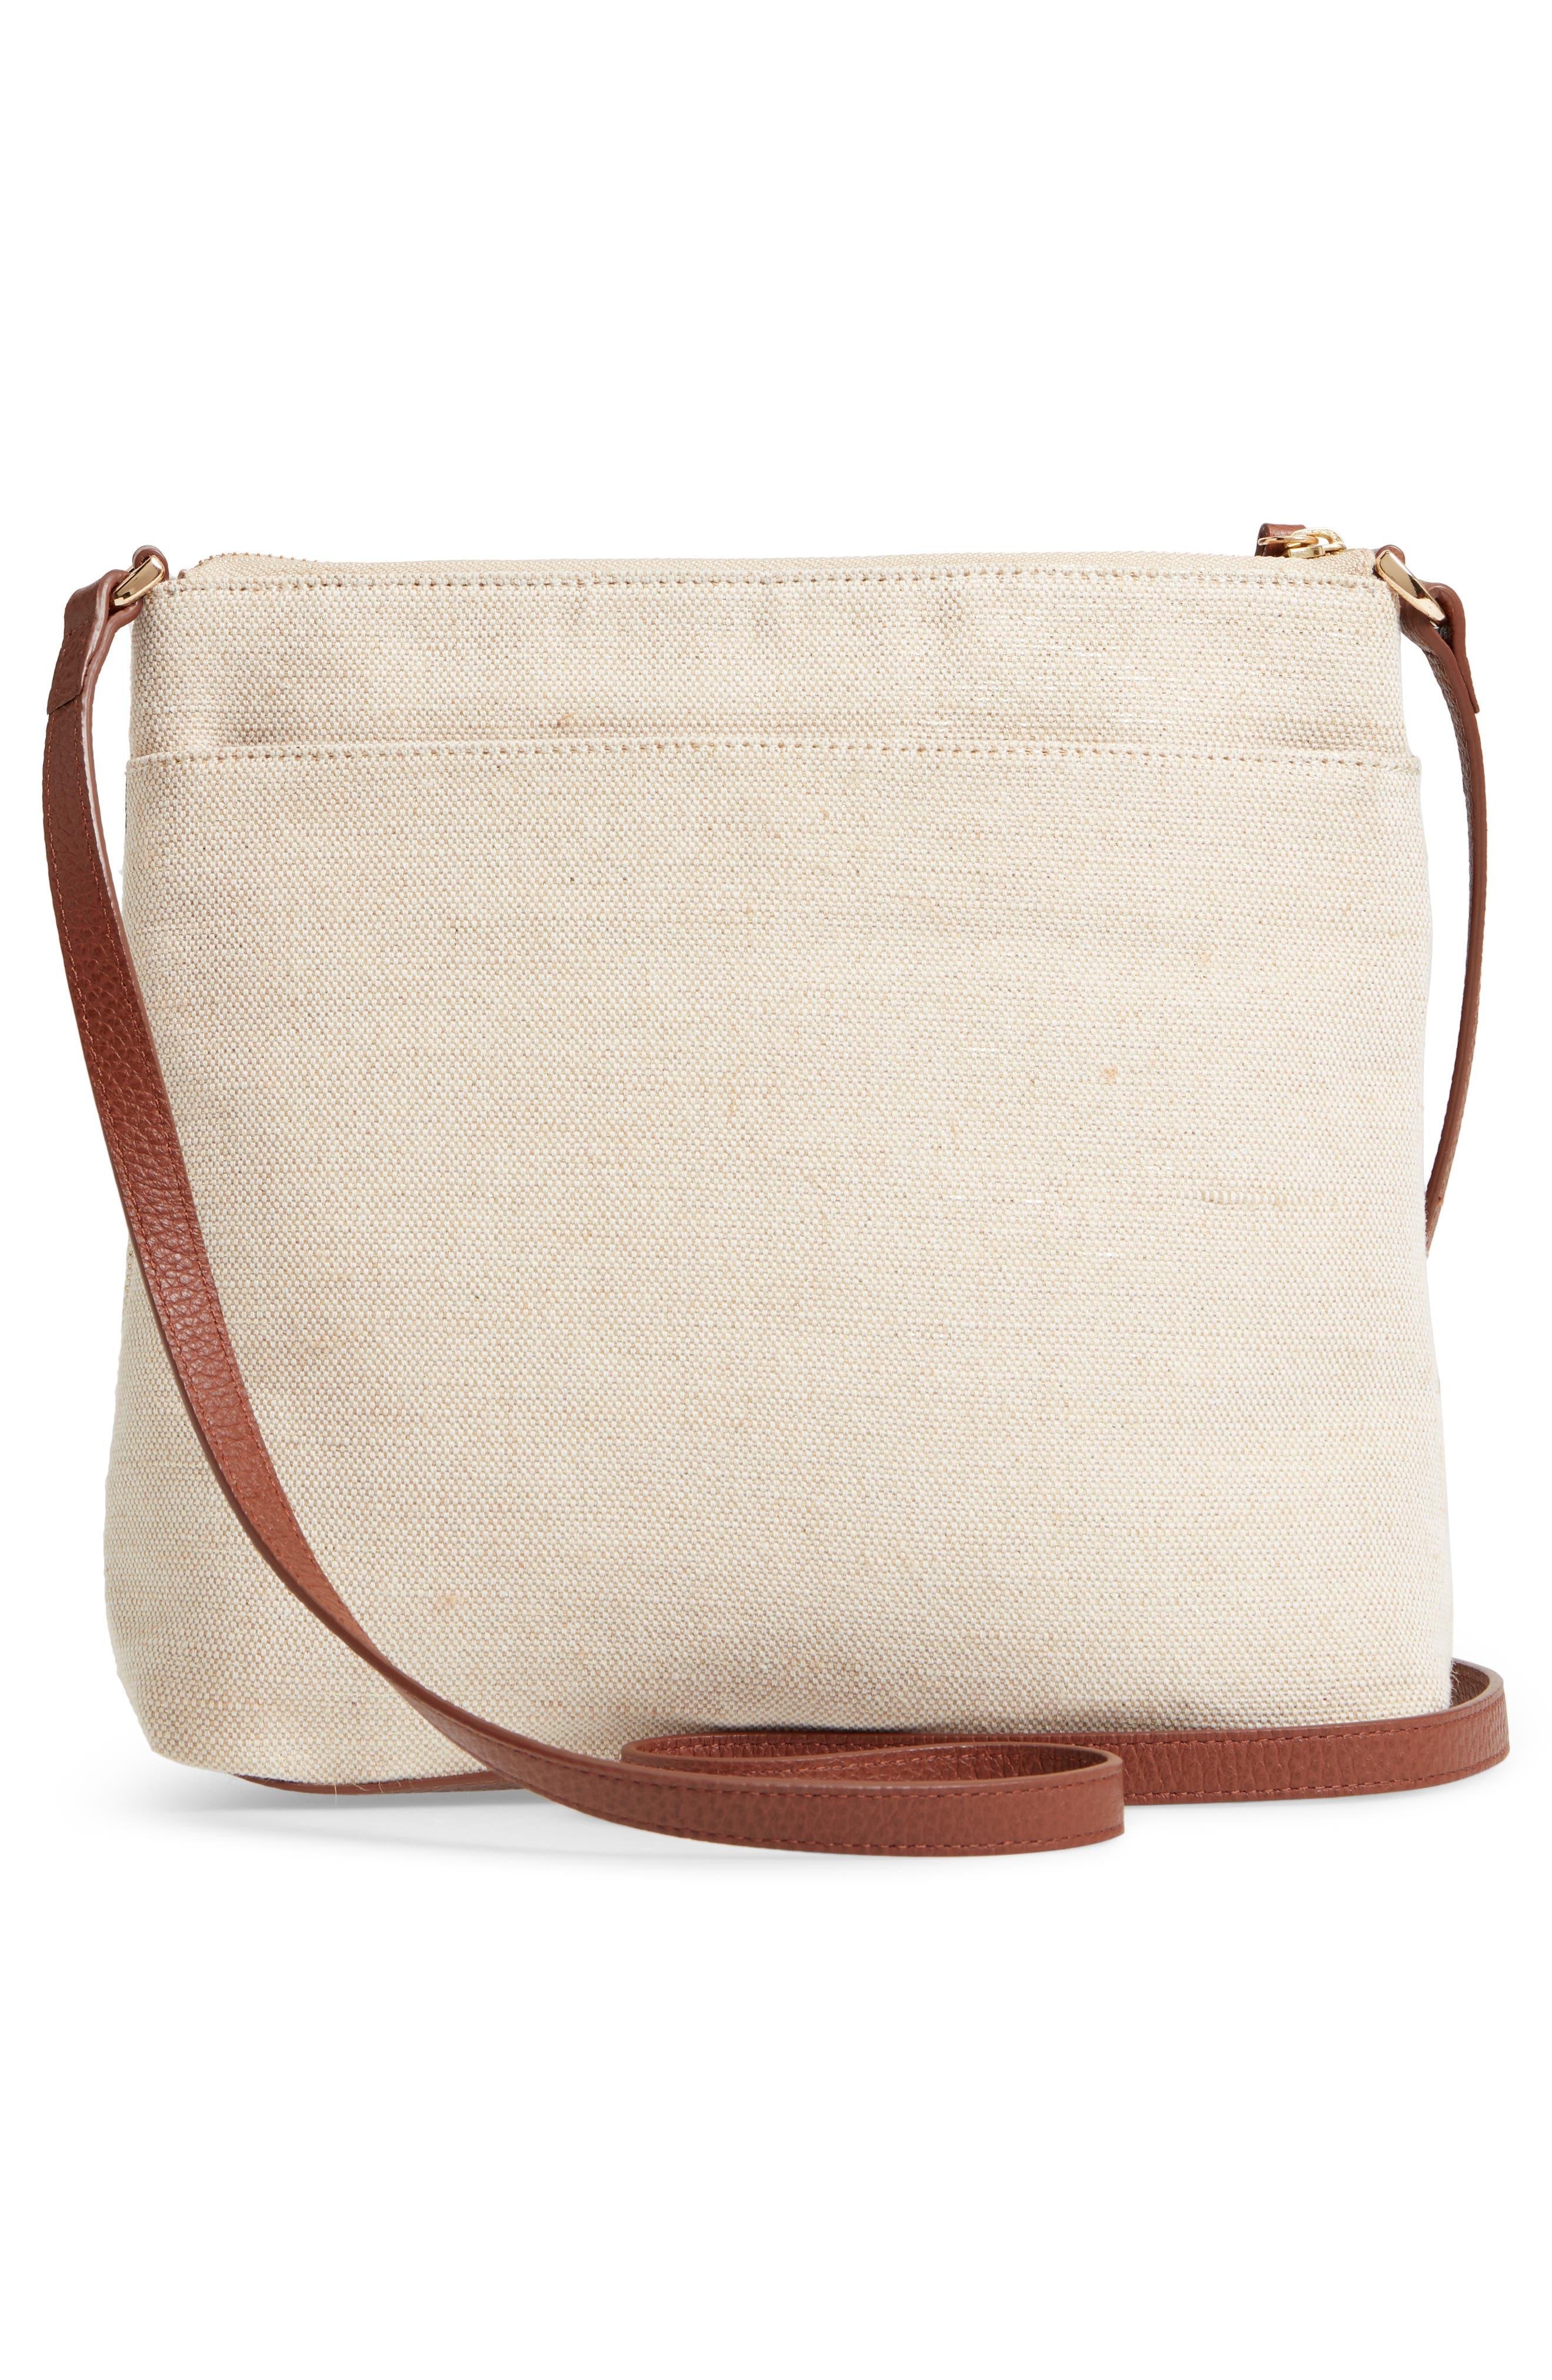 Kaison Linen & Leather Crossbody Bag,                             Alternate thumbnail 3, color,                             NATURAL/ GOLD